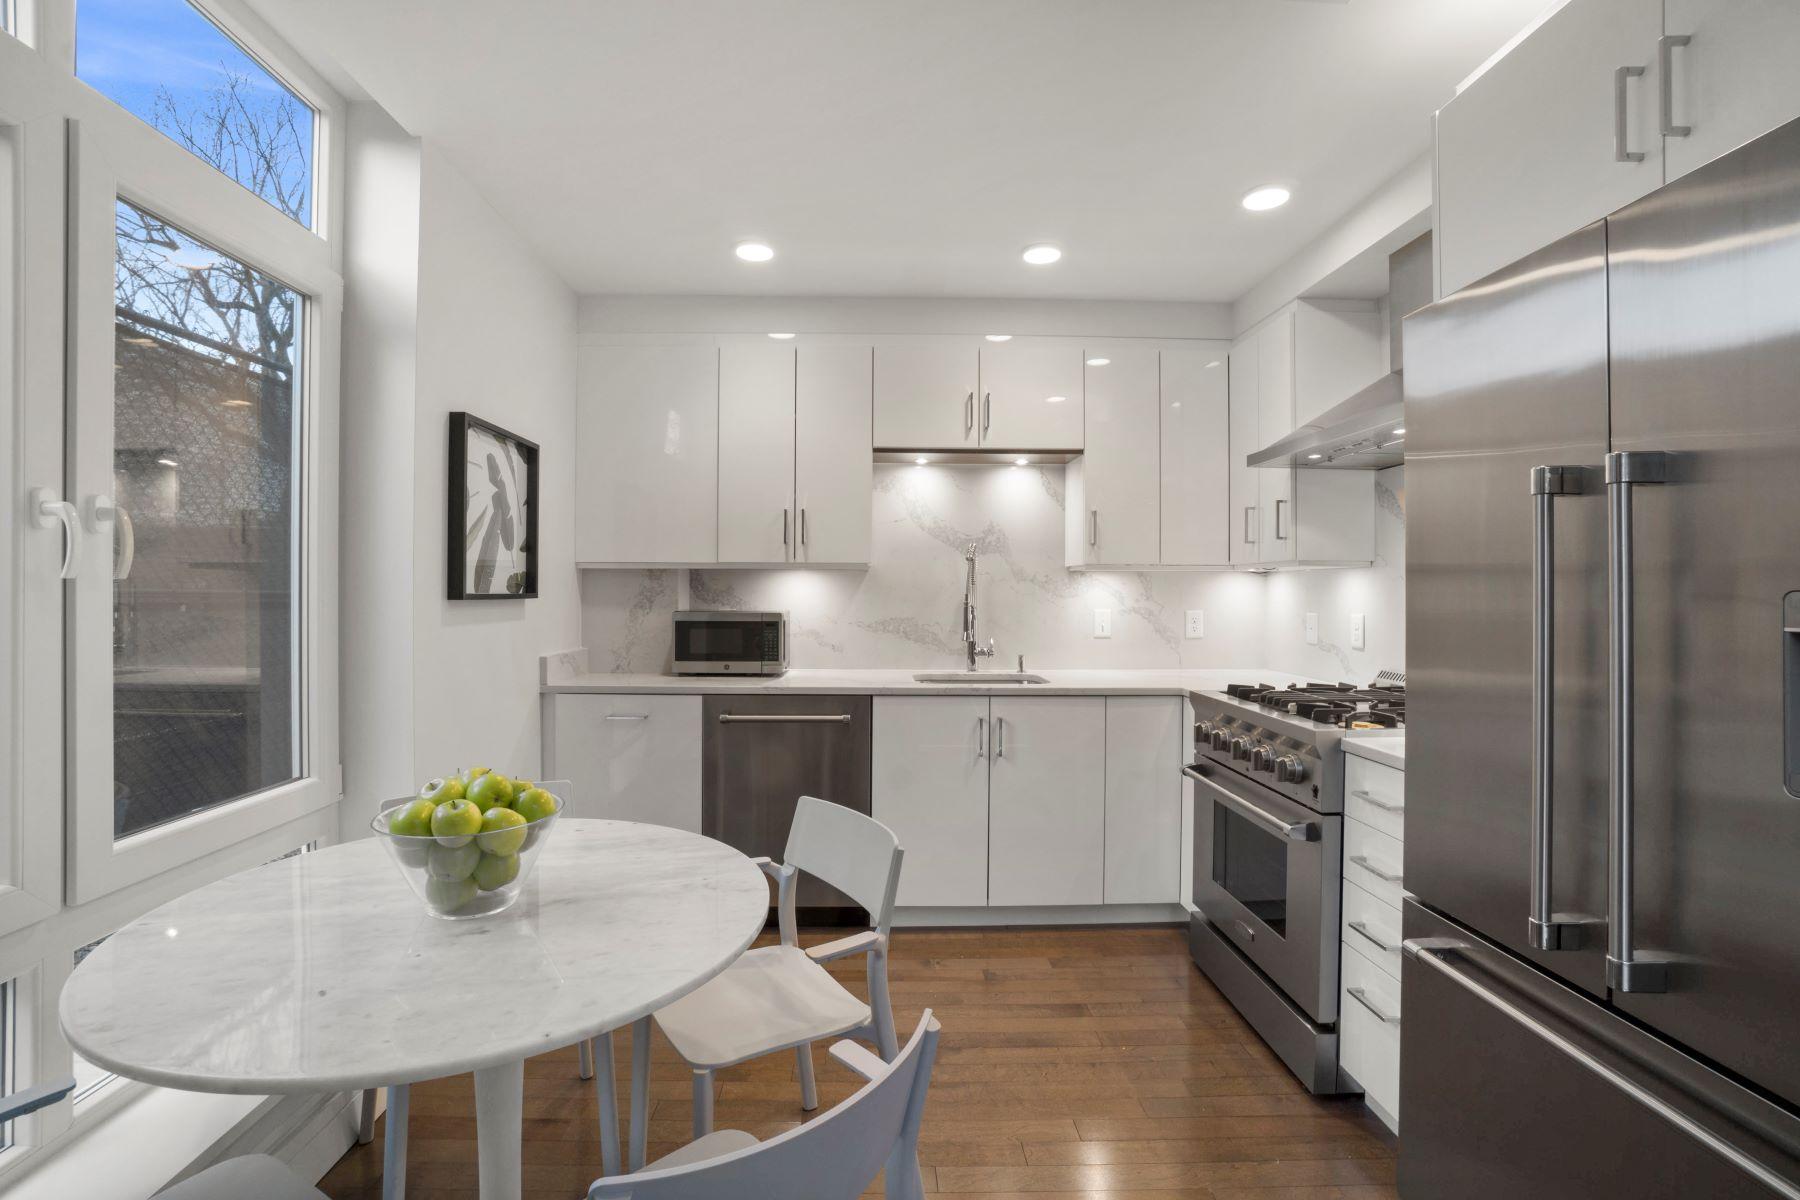 Condominiums for Sale at 262 Monsignor O'Brien Hwy - Unit 102 262 Monsignor Obrien Hwy 102 Cambridge, Massachusetts 02141 United States